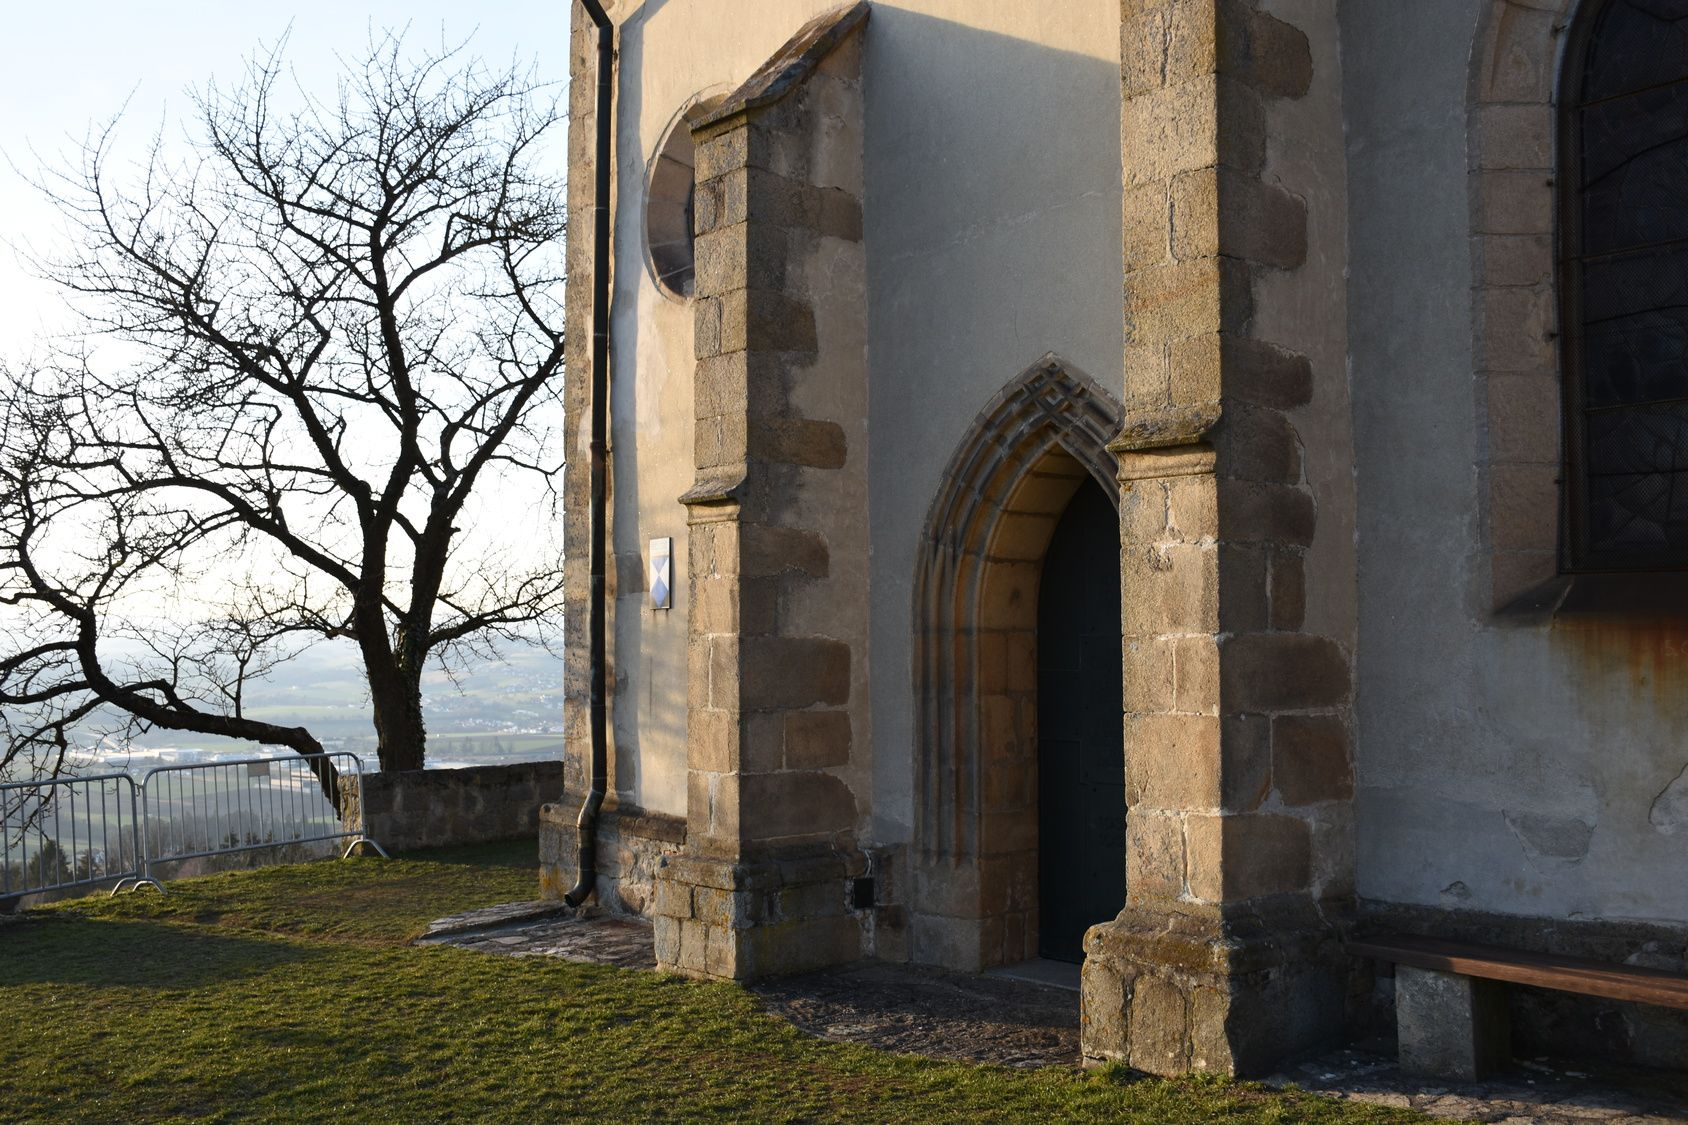 Wartberg Wenzelskirche